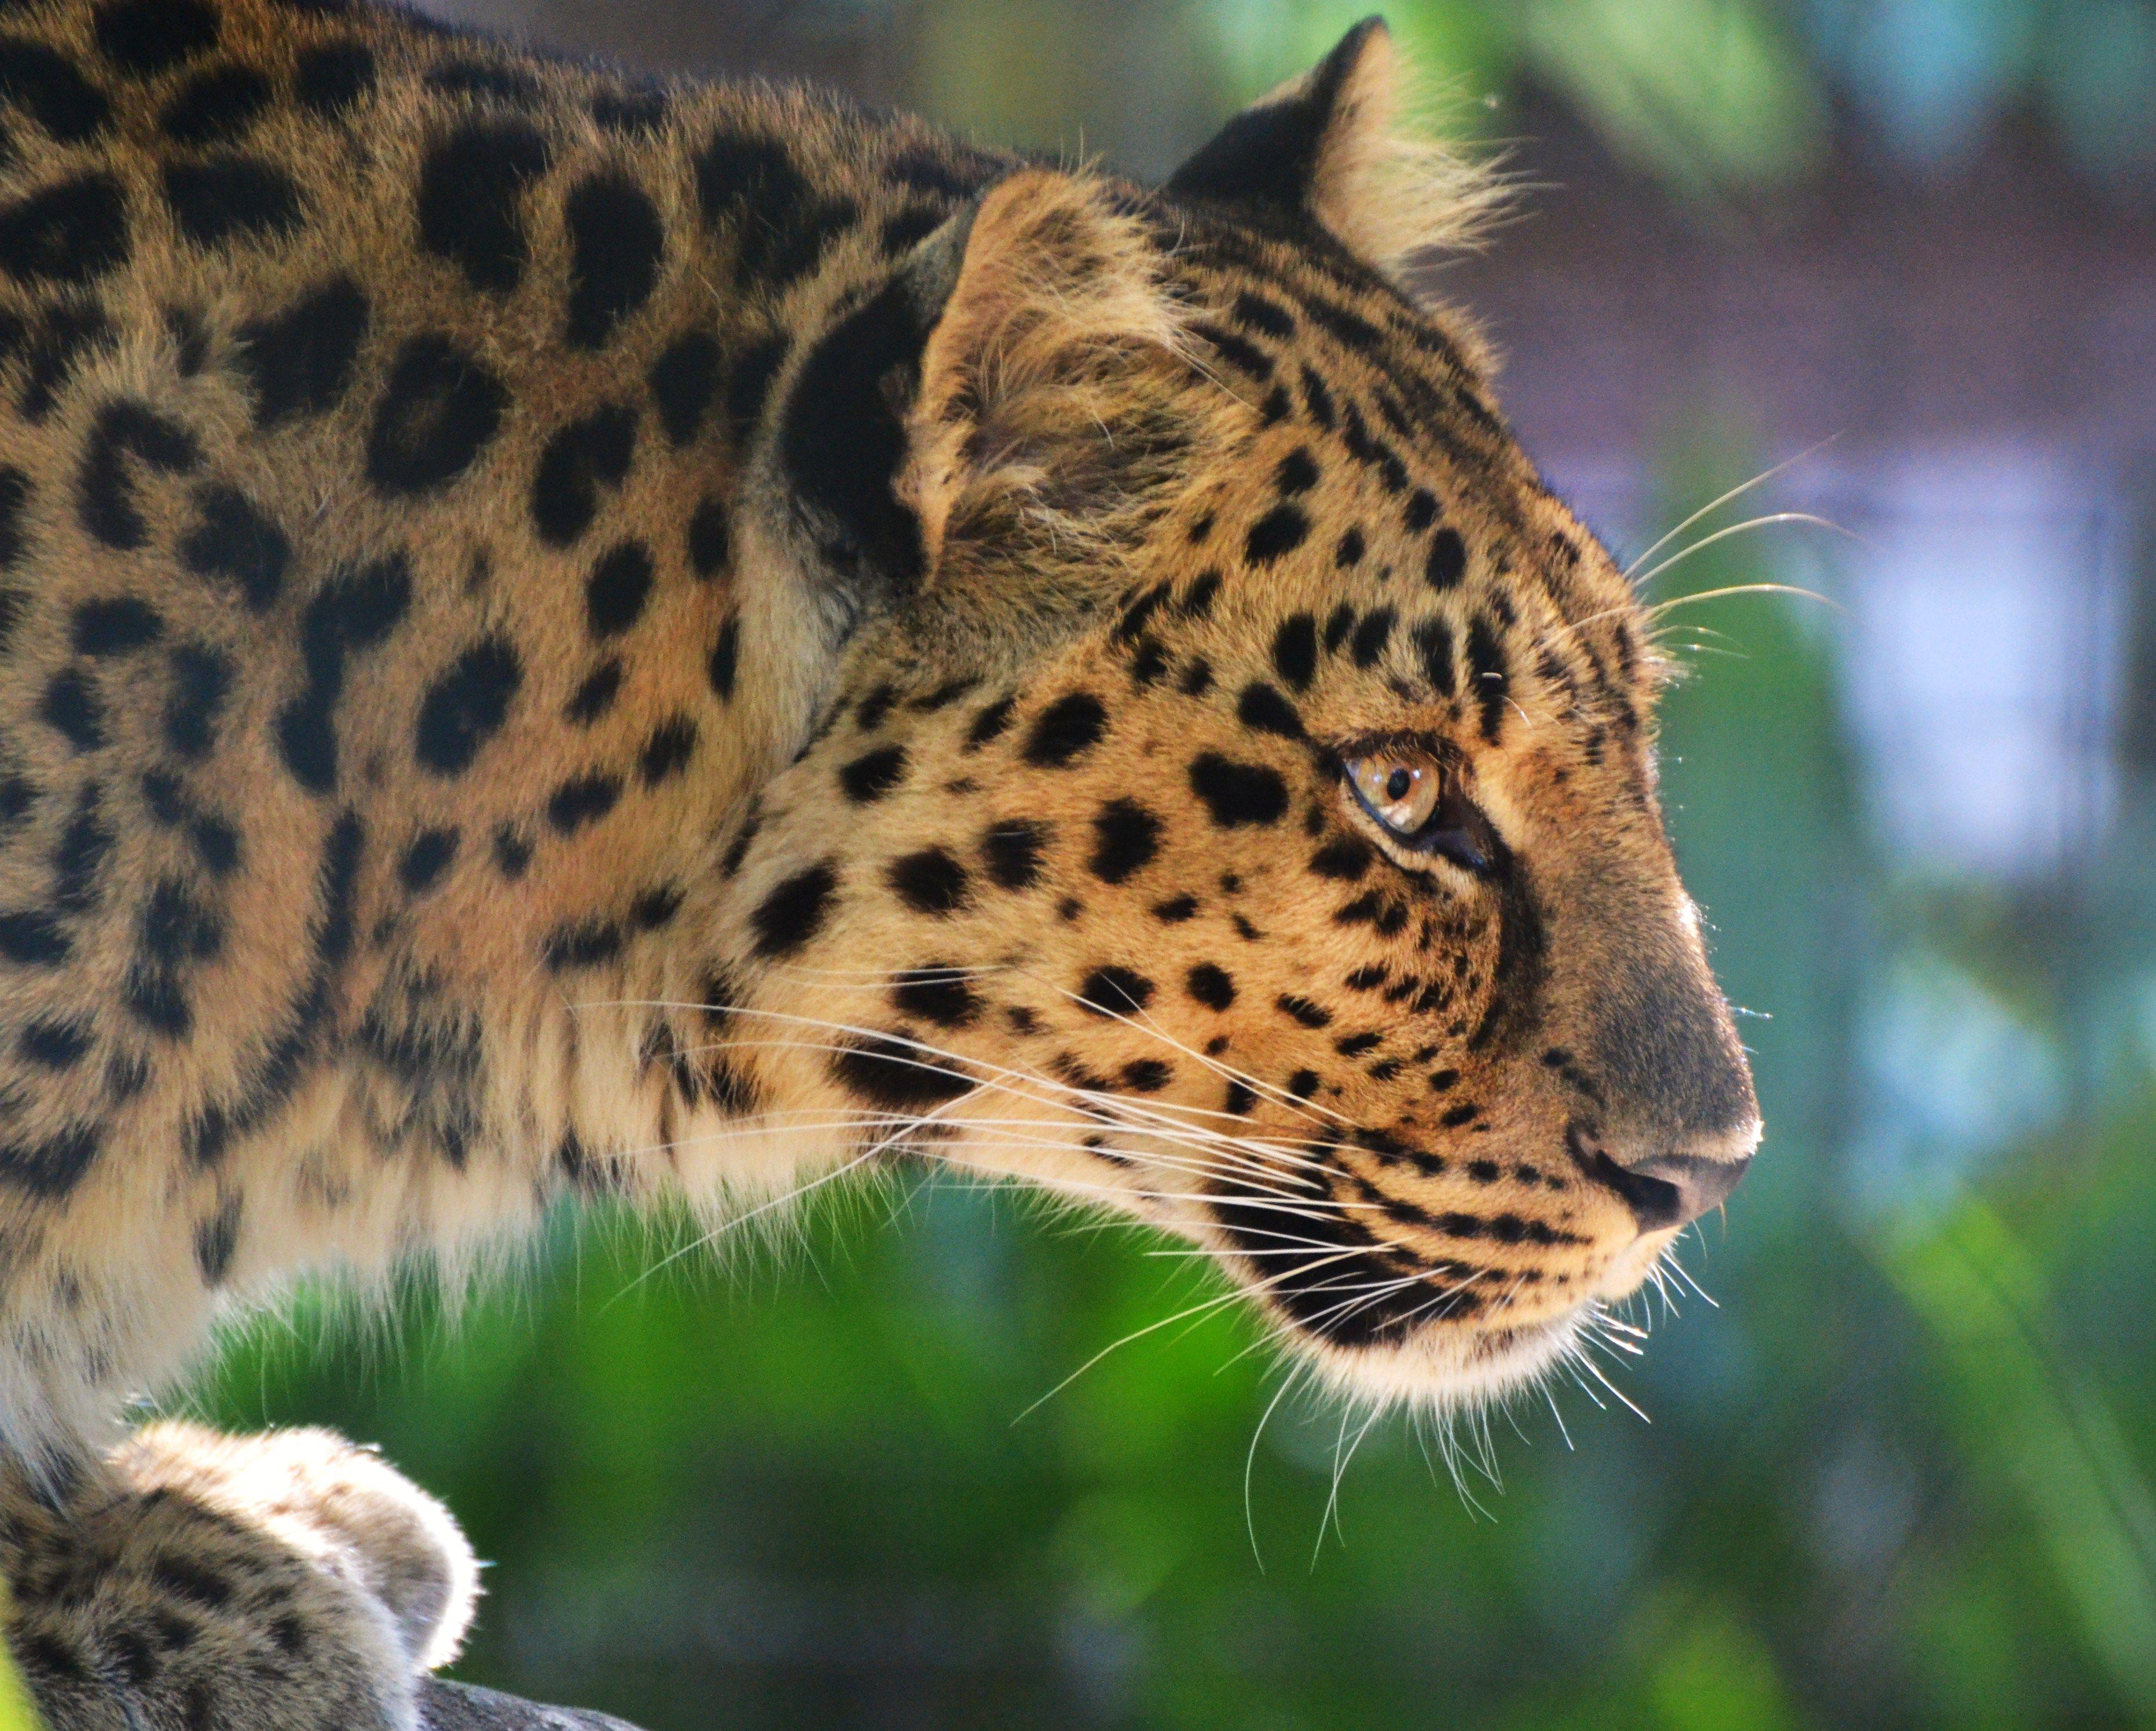 Snow leopard face side - photo#47